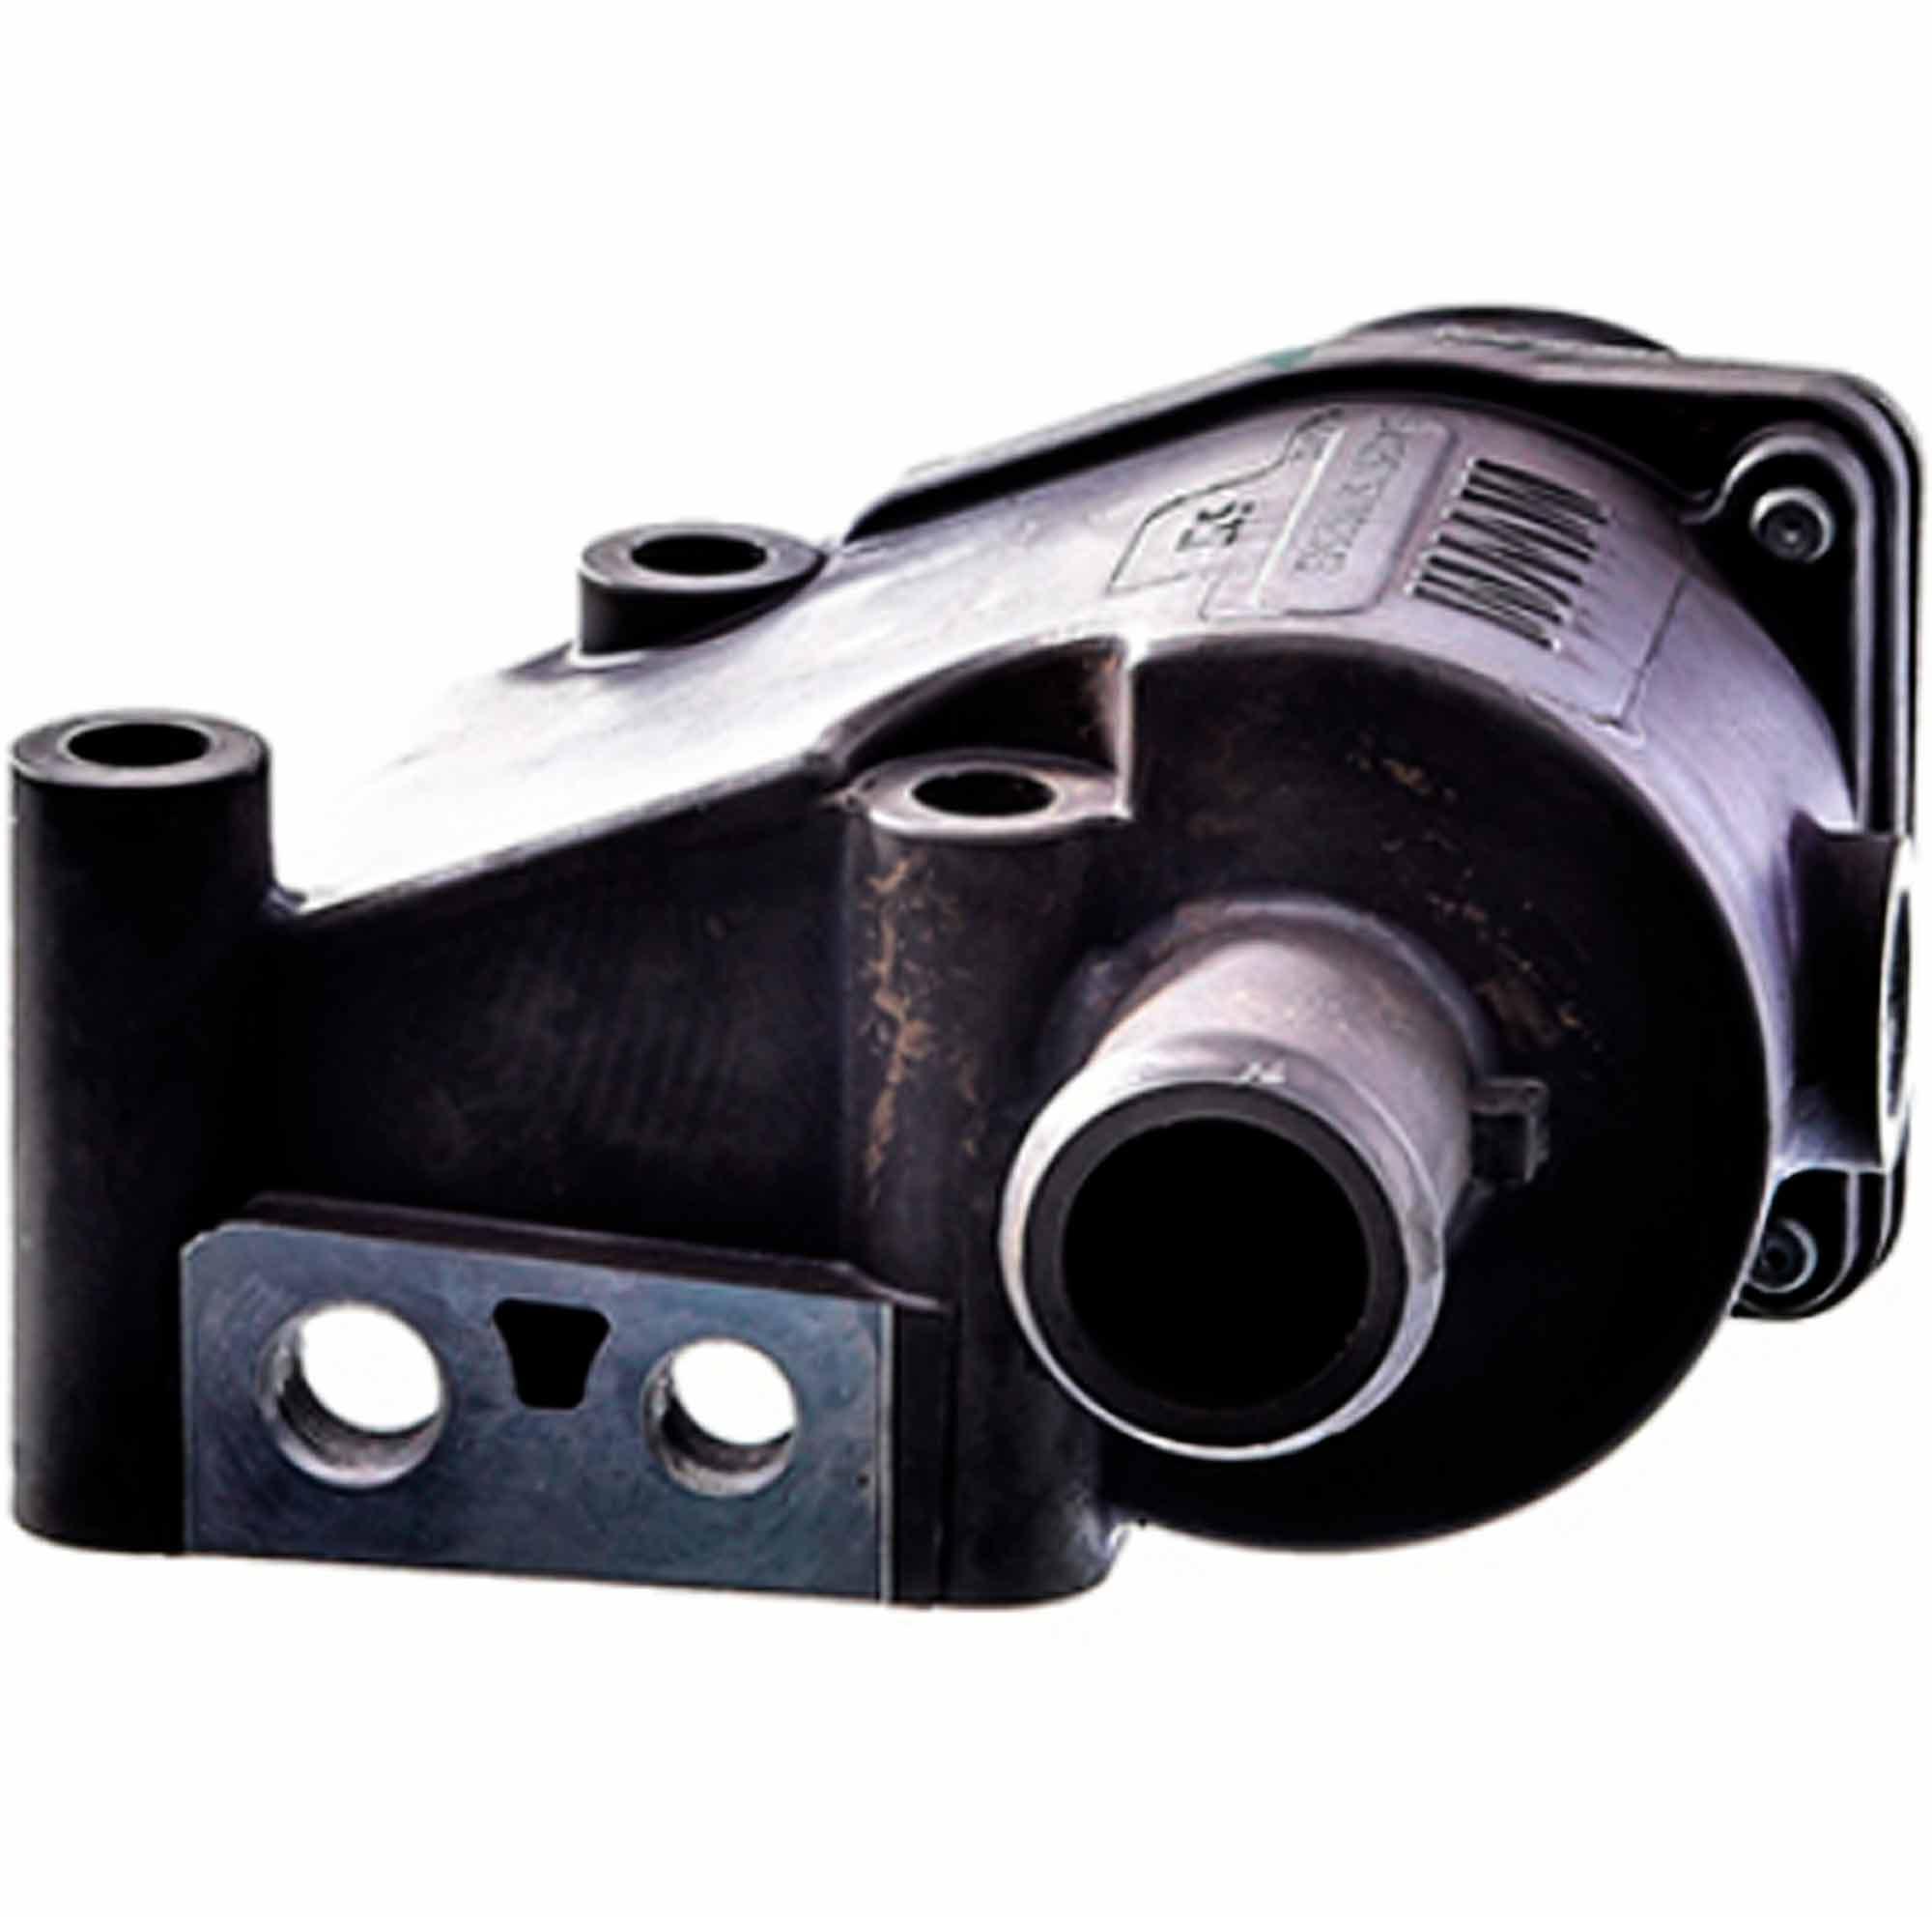 941207570026E - Válvula termostática